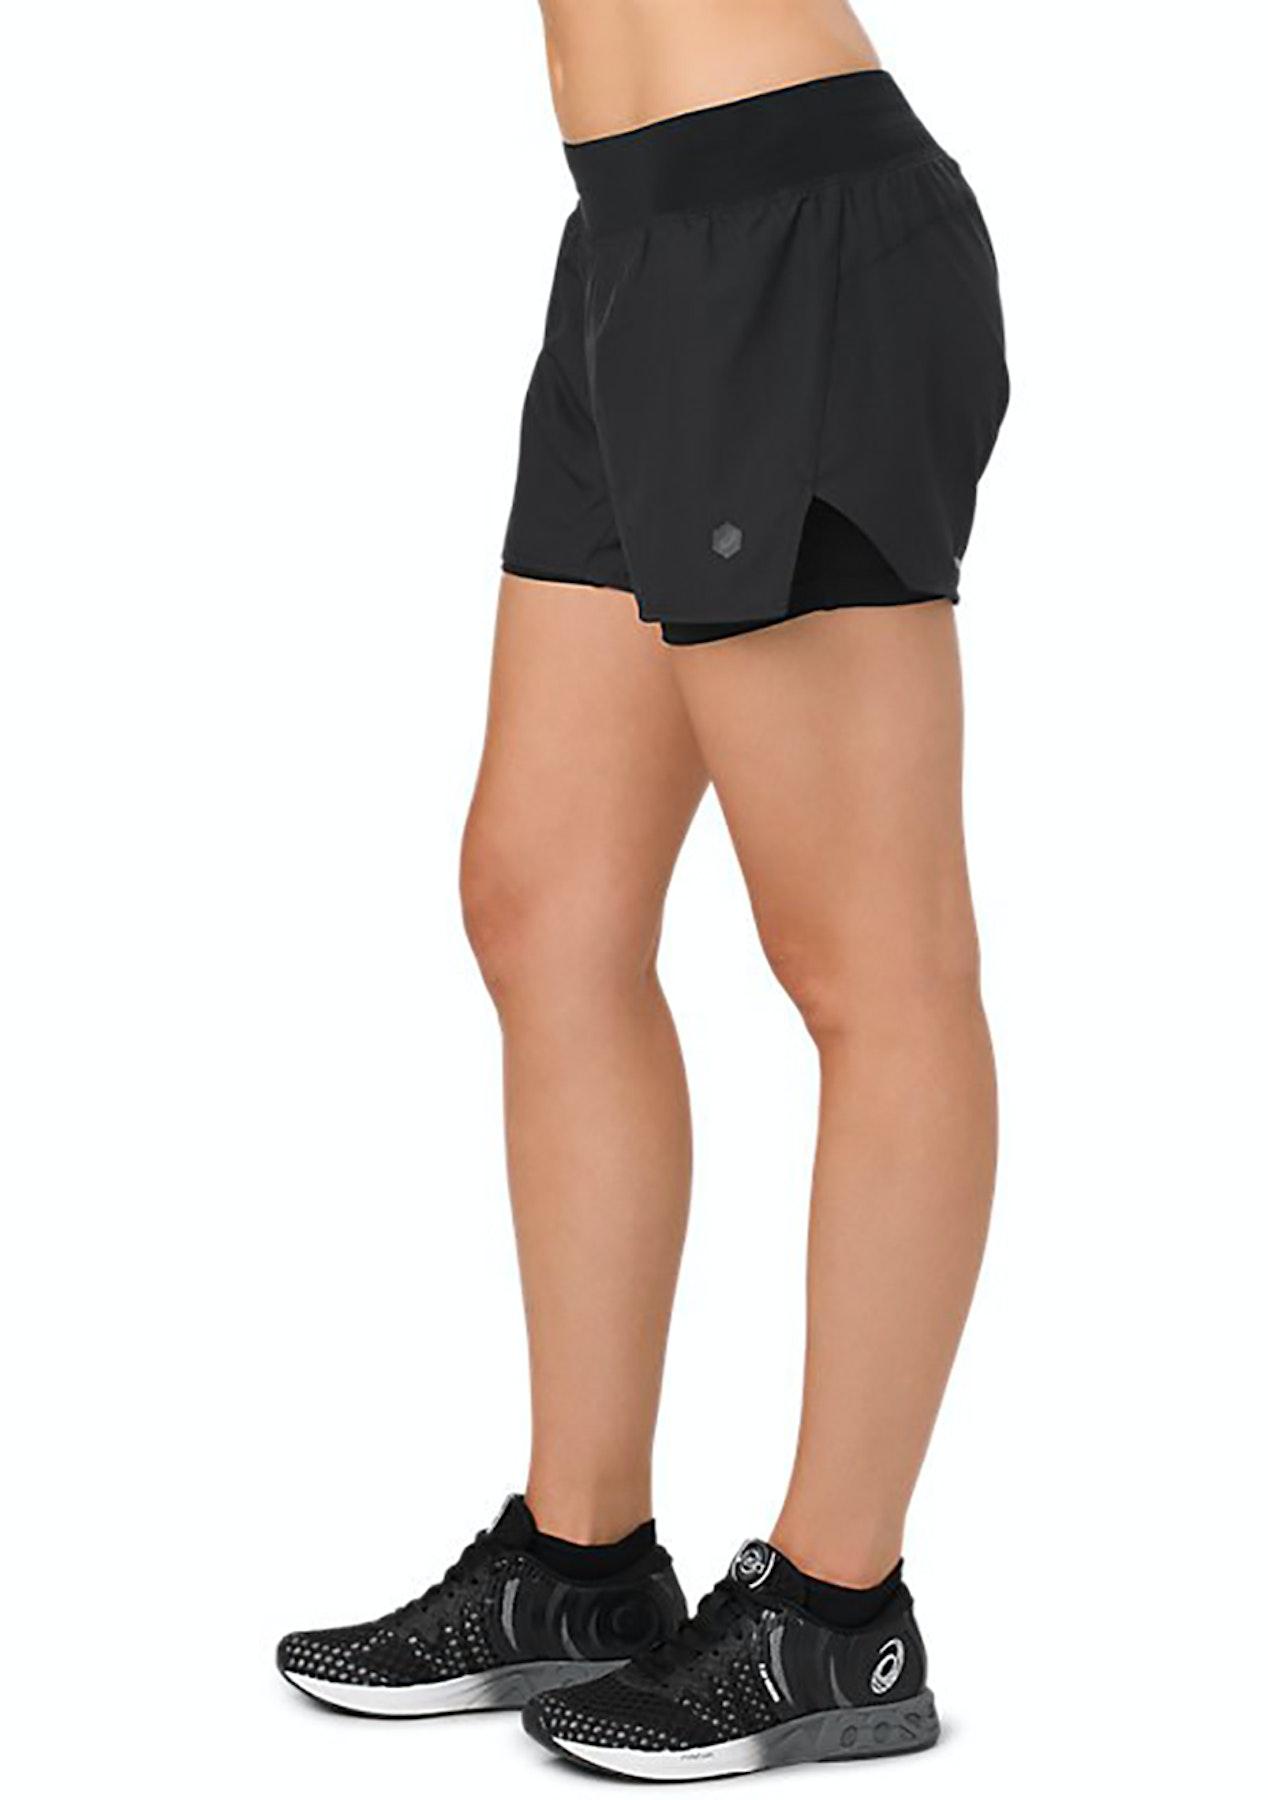 721b667ca1 Asics - Womens Cool 2-N-1 3.5In Short - Performance Black